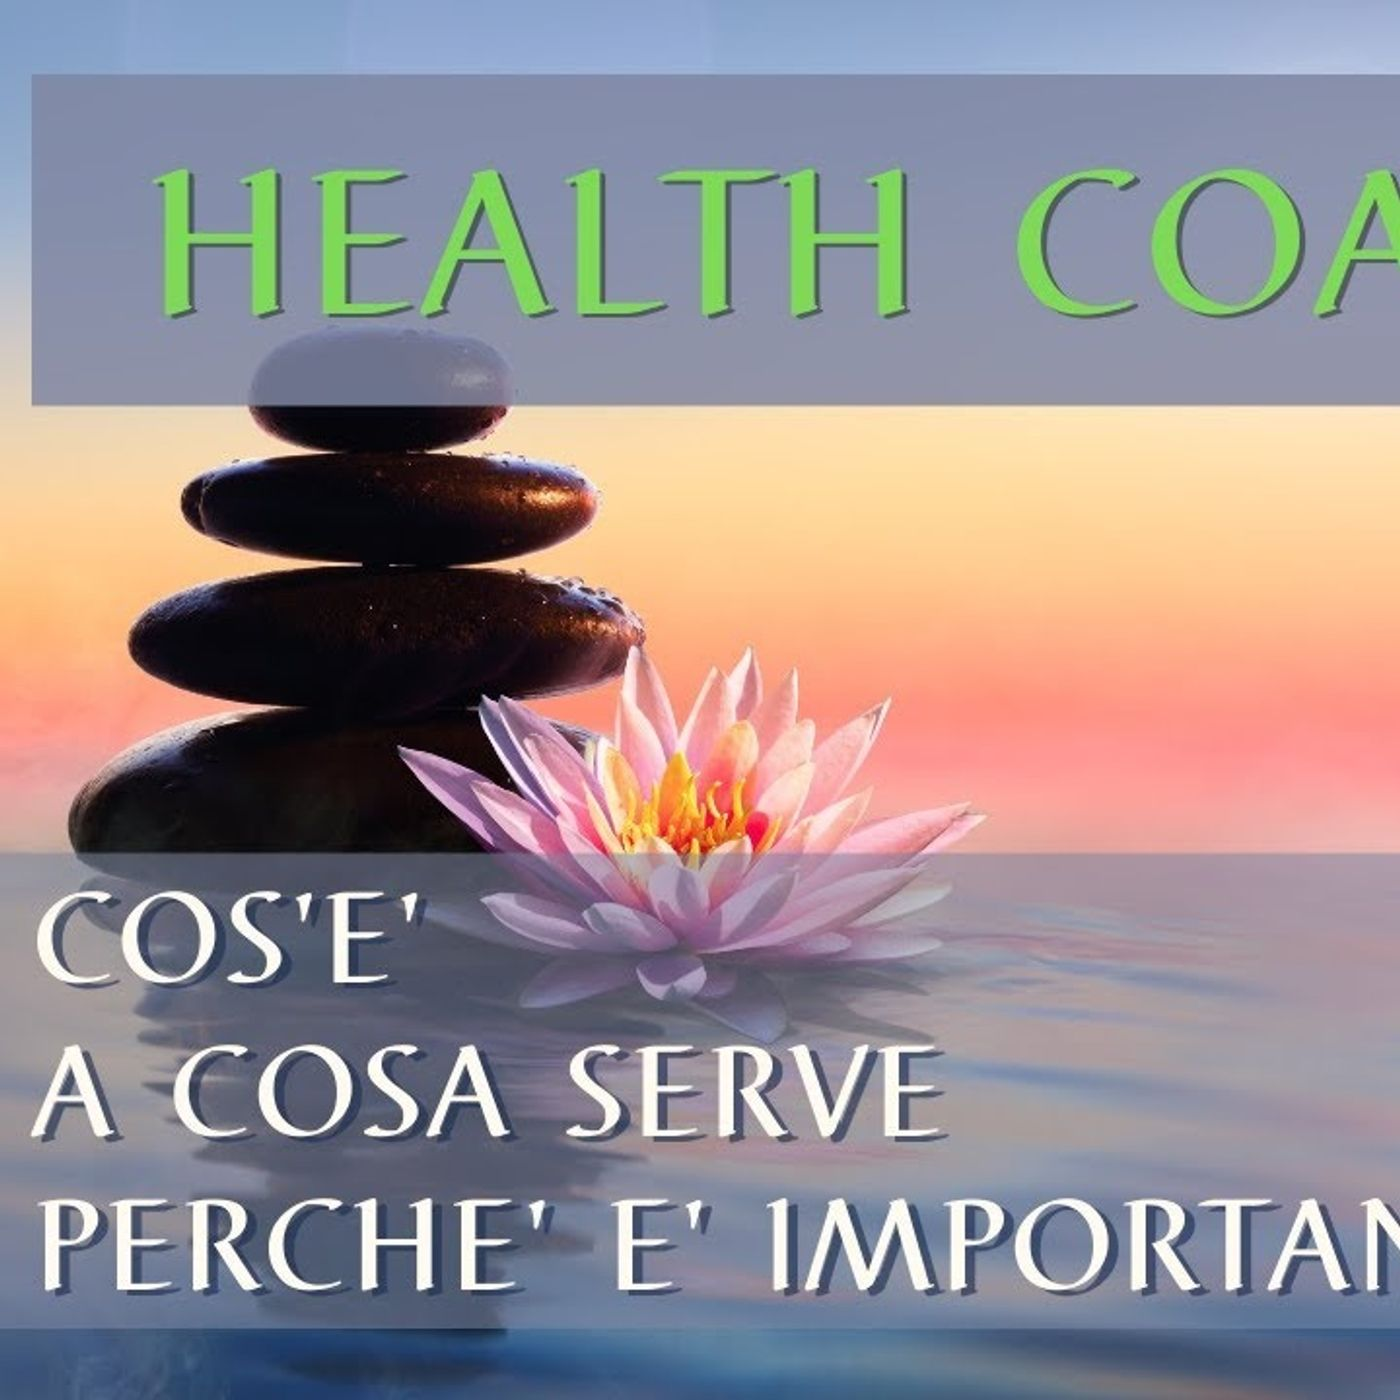 Health Coaching | Cos'è - A cosa serve - Perché è importante | Con Helena Mercuri | Live